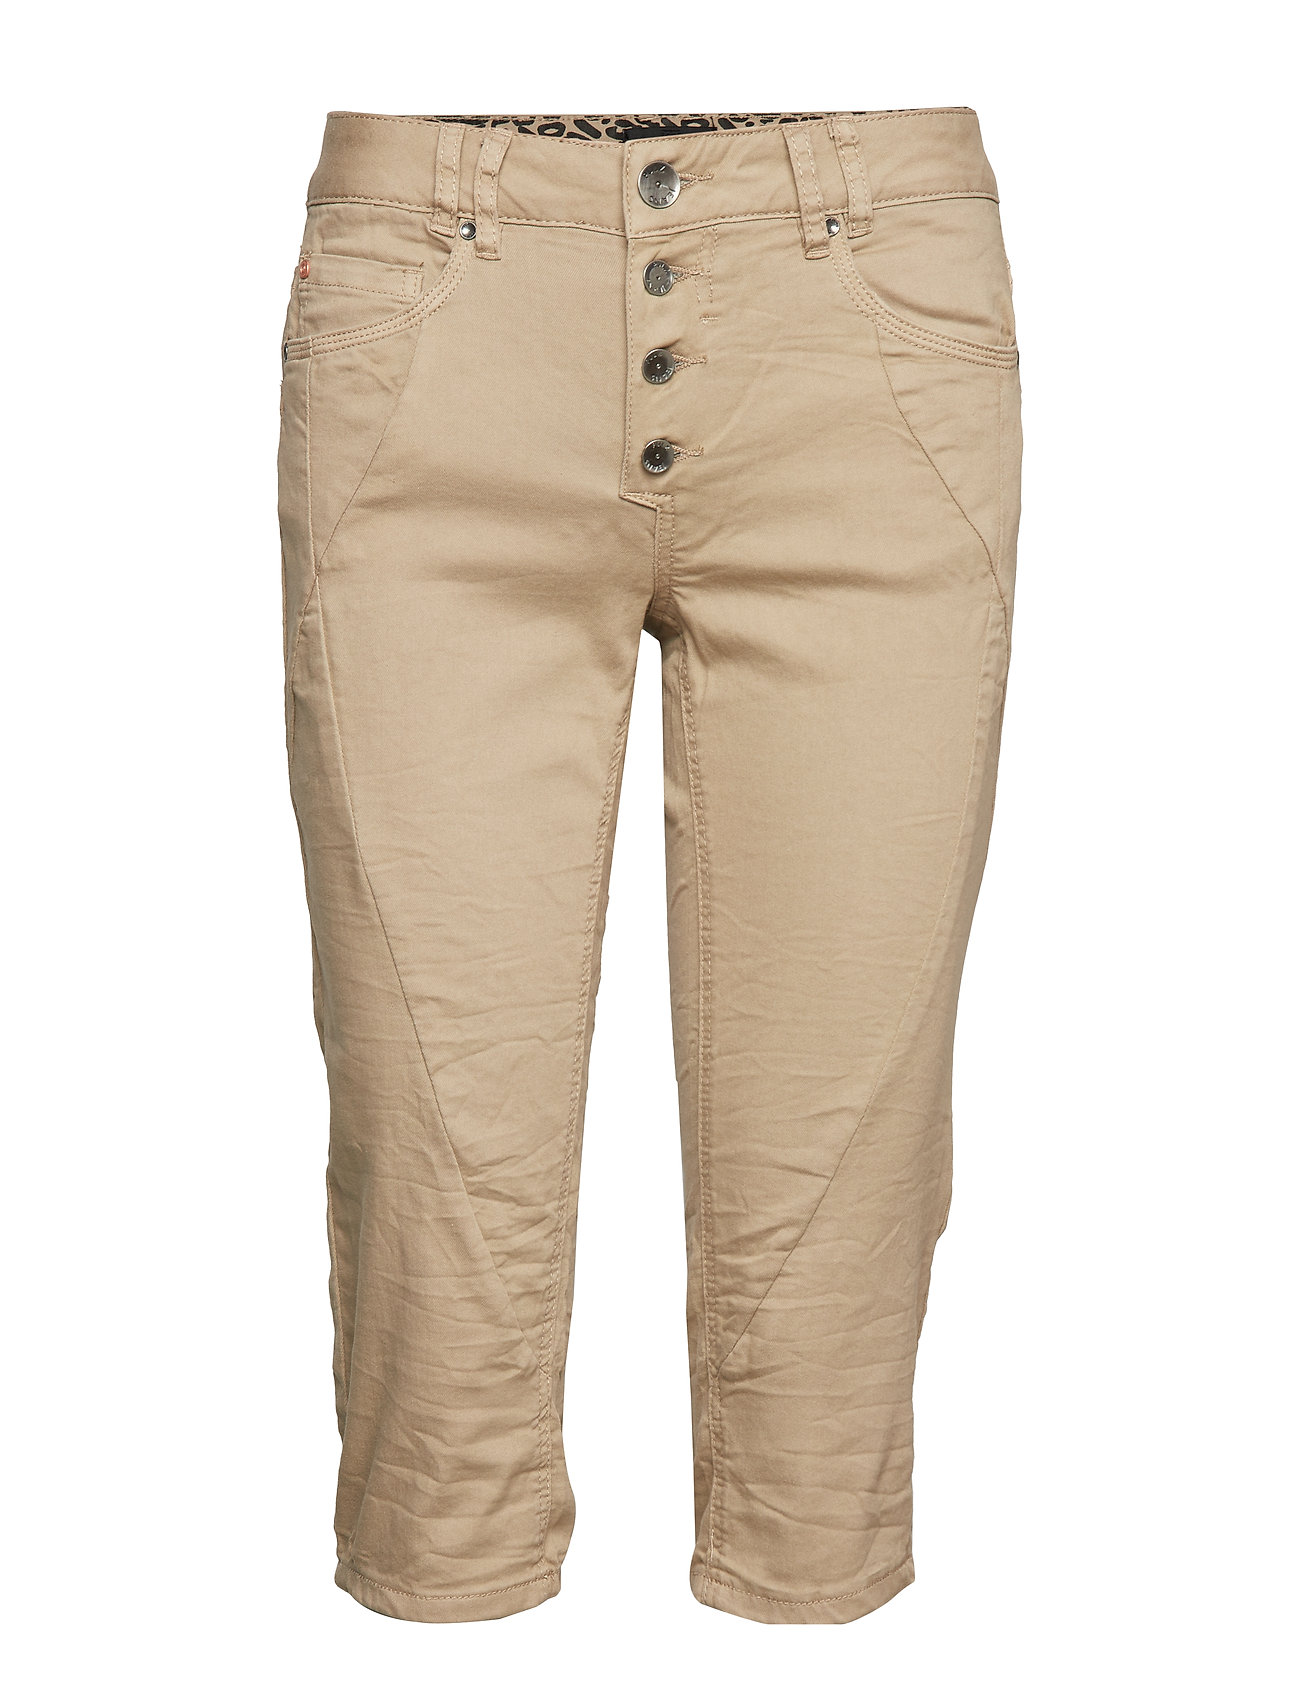 Pulz Jeans Rosita Capri Pants